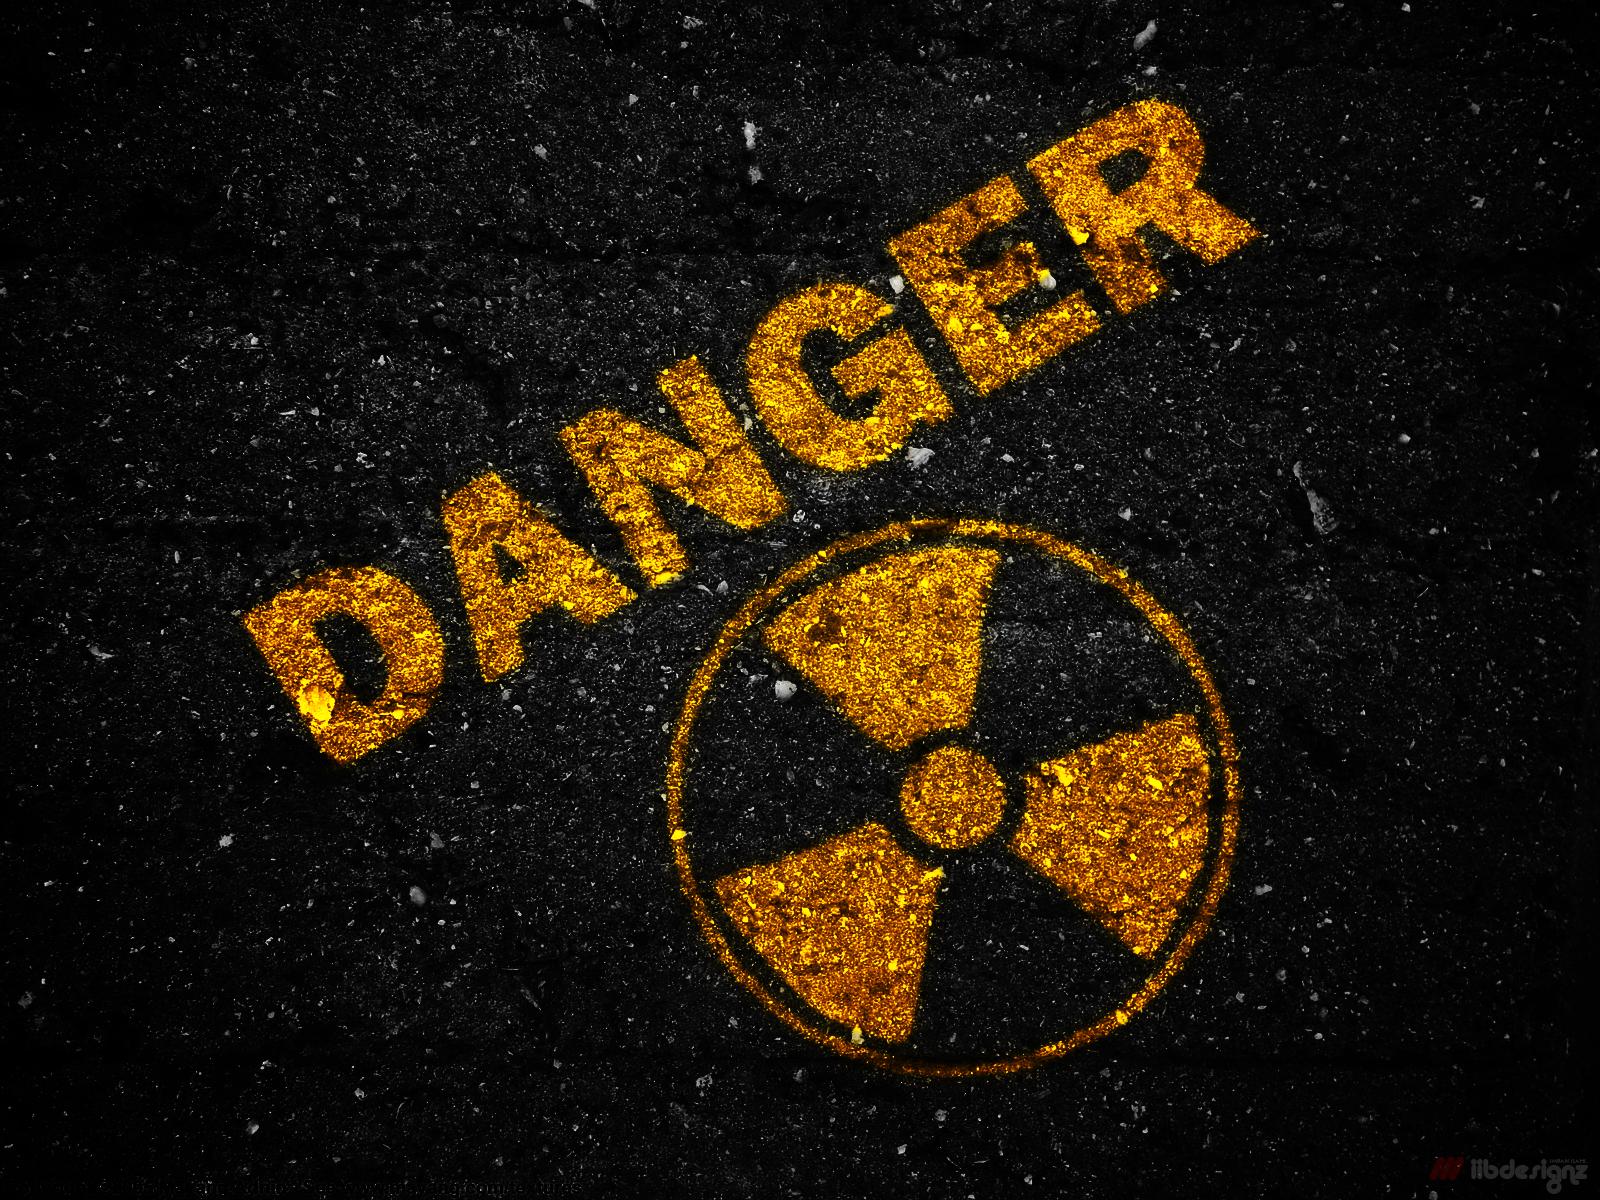 http://4.bp.blogspot.com/-Y_q--cXfb5A/UAOgMYKdBgI/AAAAAAAAAKk/bZWNH1wmWJM/s1600/danger-wallpapers_29840_1600x1200.jpg